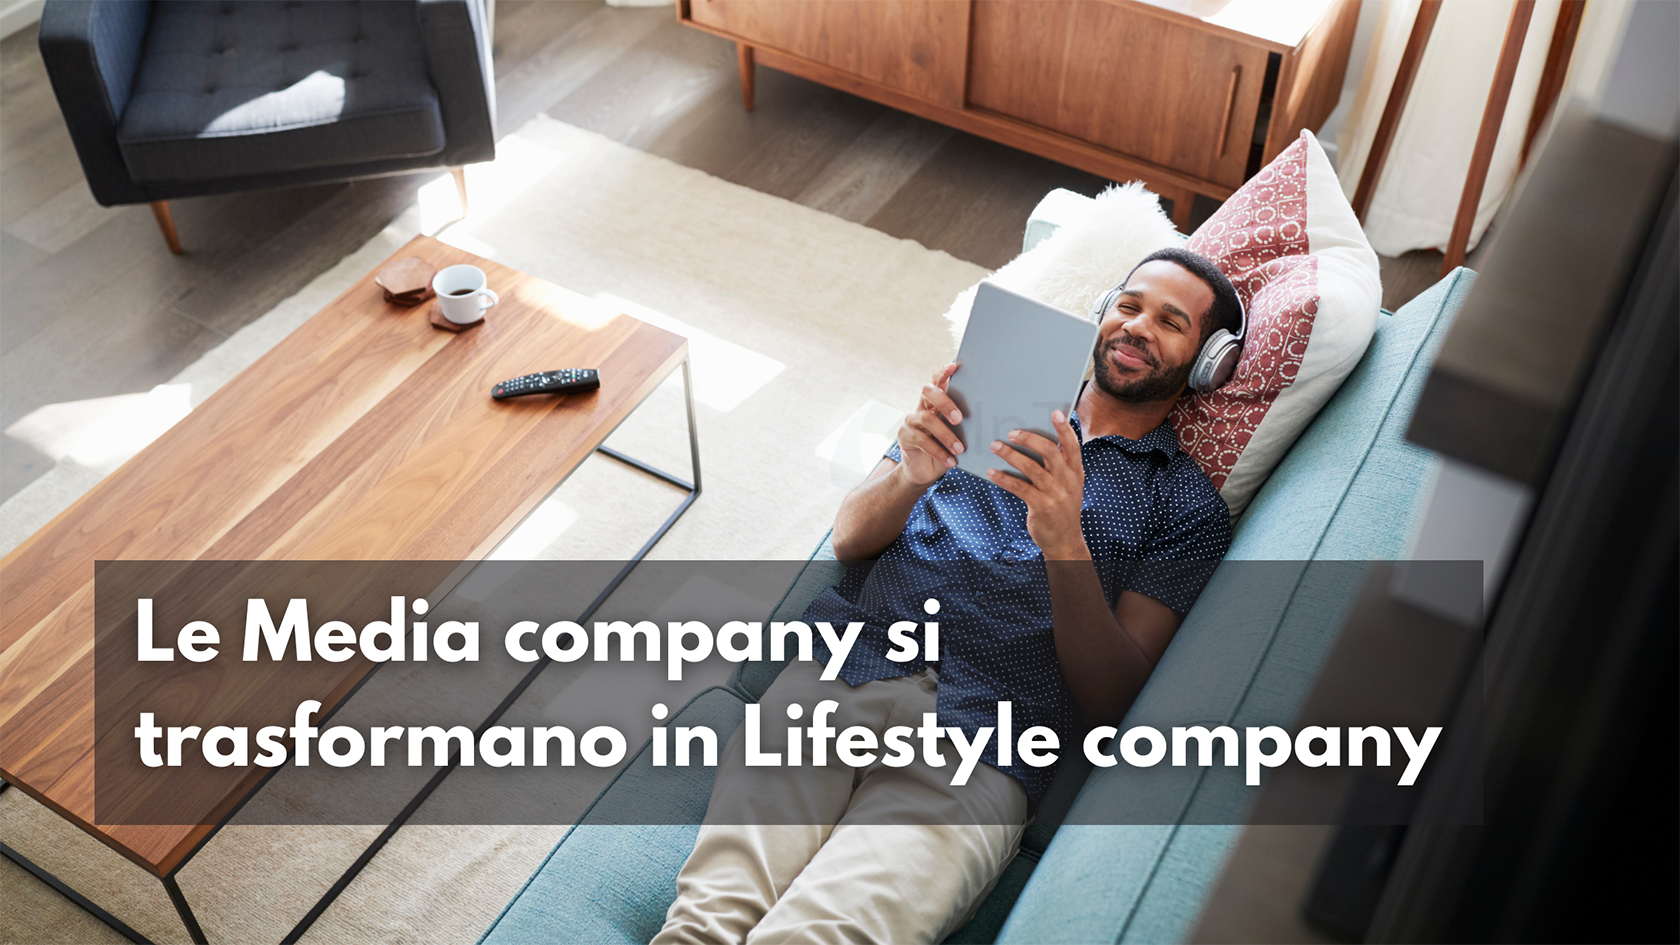 media company trasformano Lifestyle company franzrusso.it